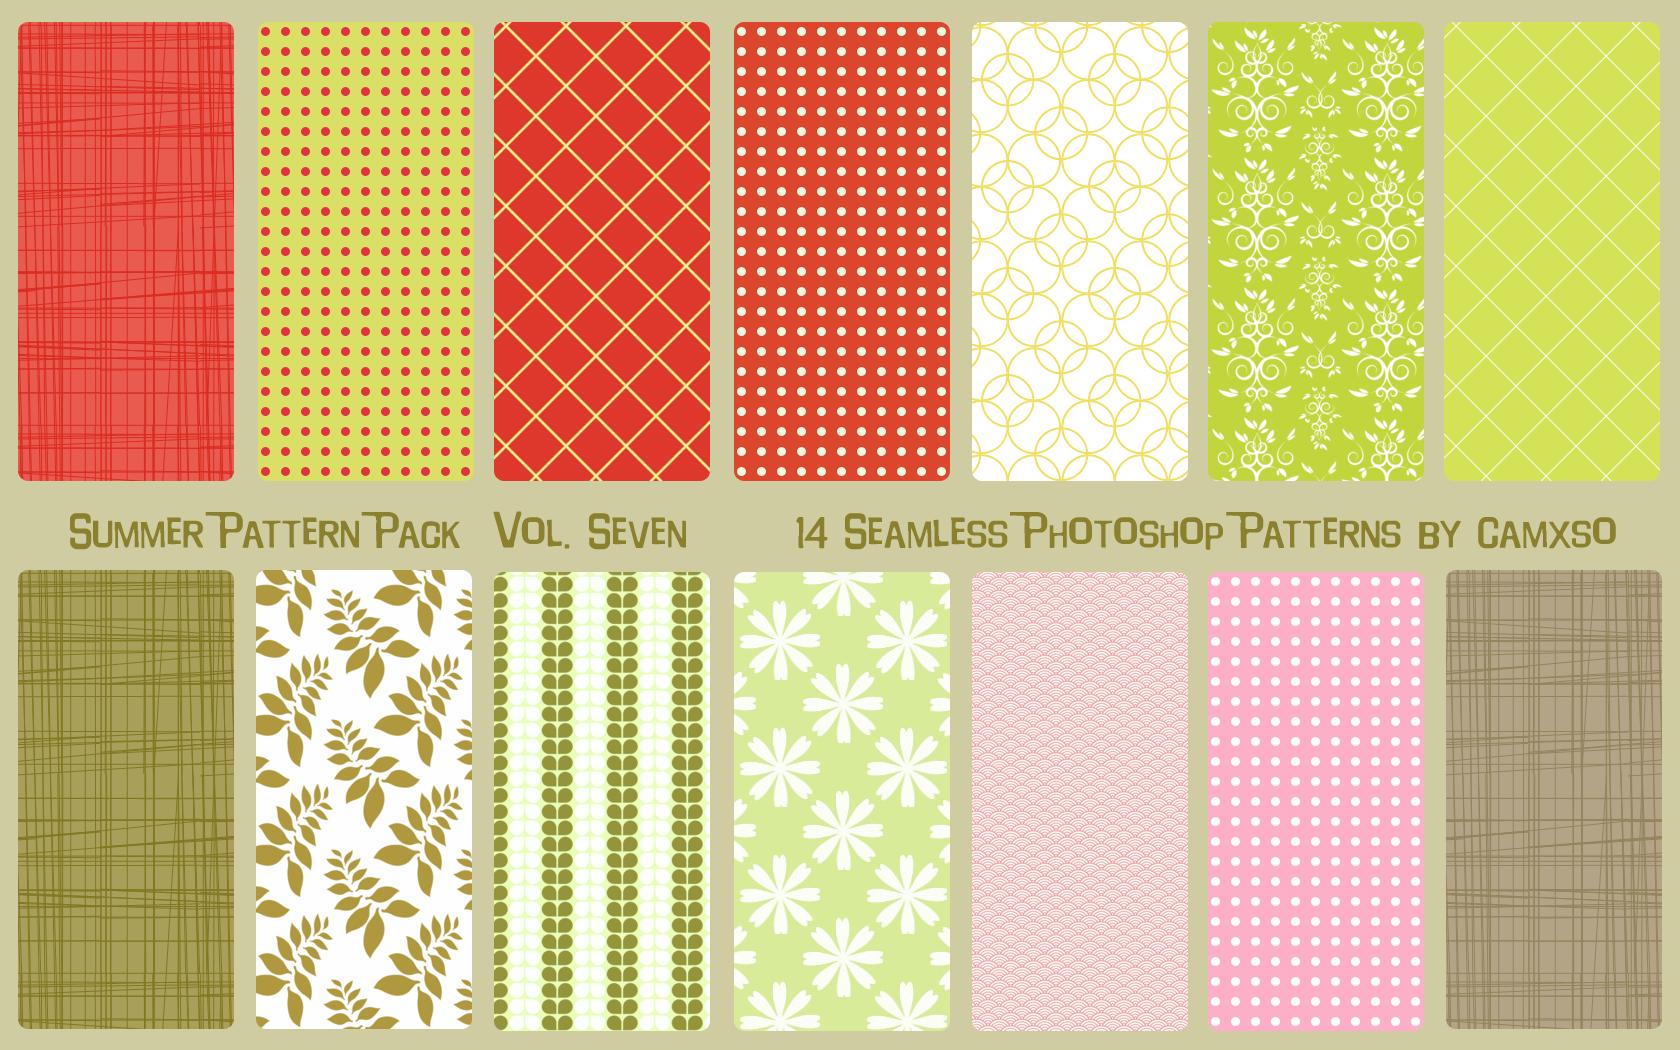 Summer Pattern Pack Vol  7 by Camxso deviantart com on